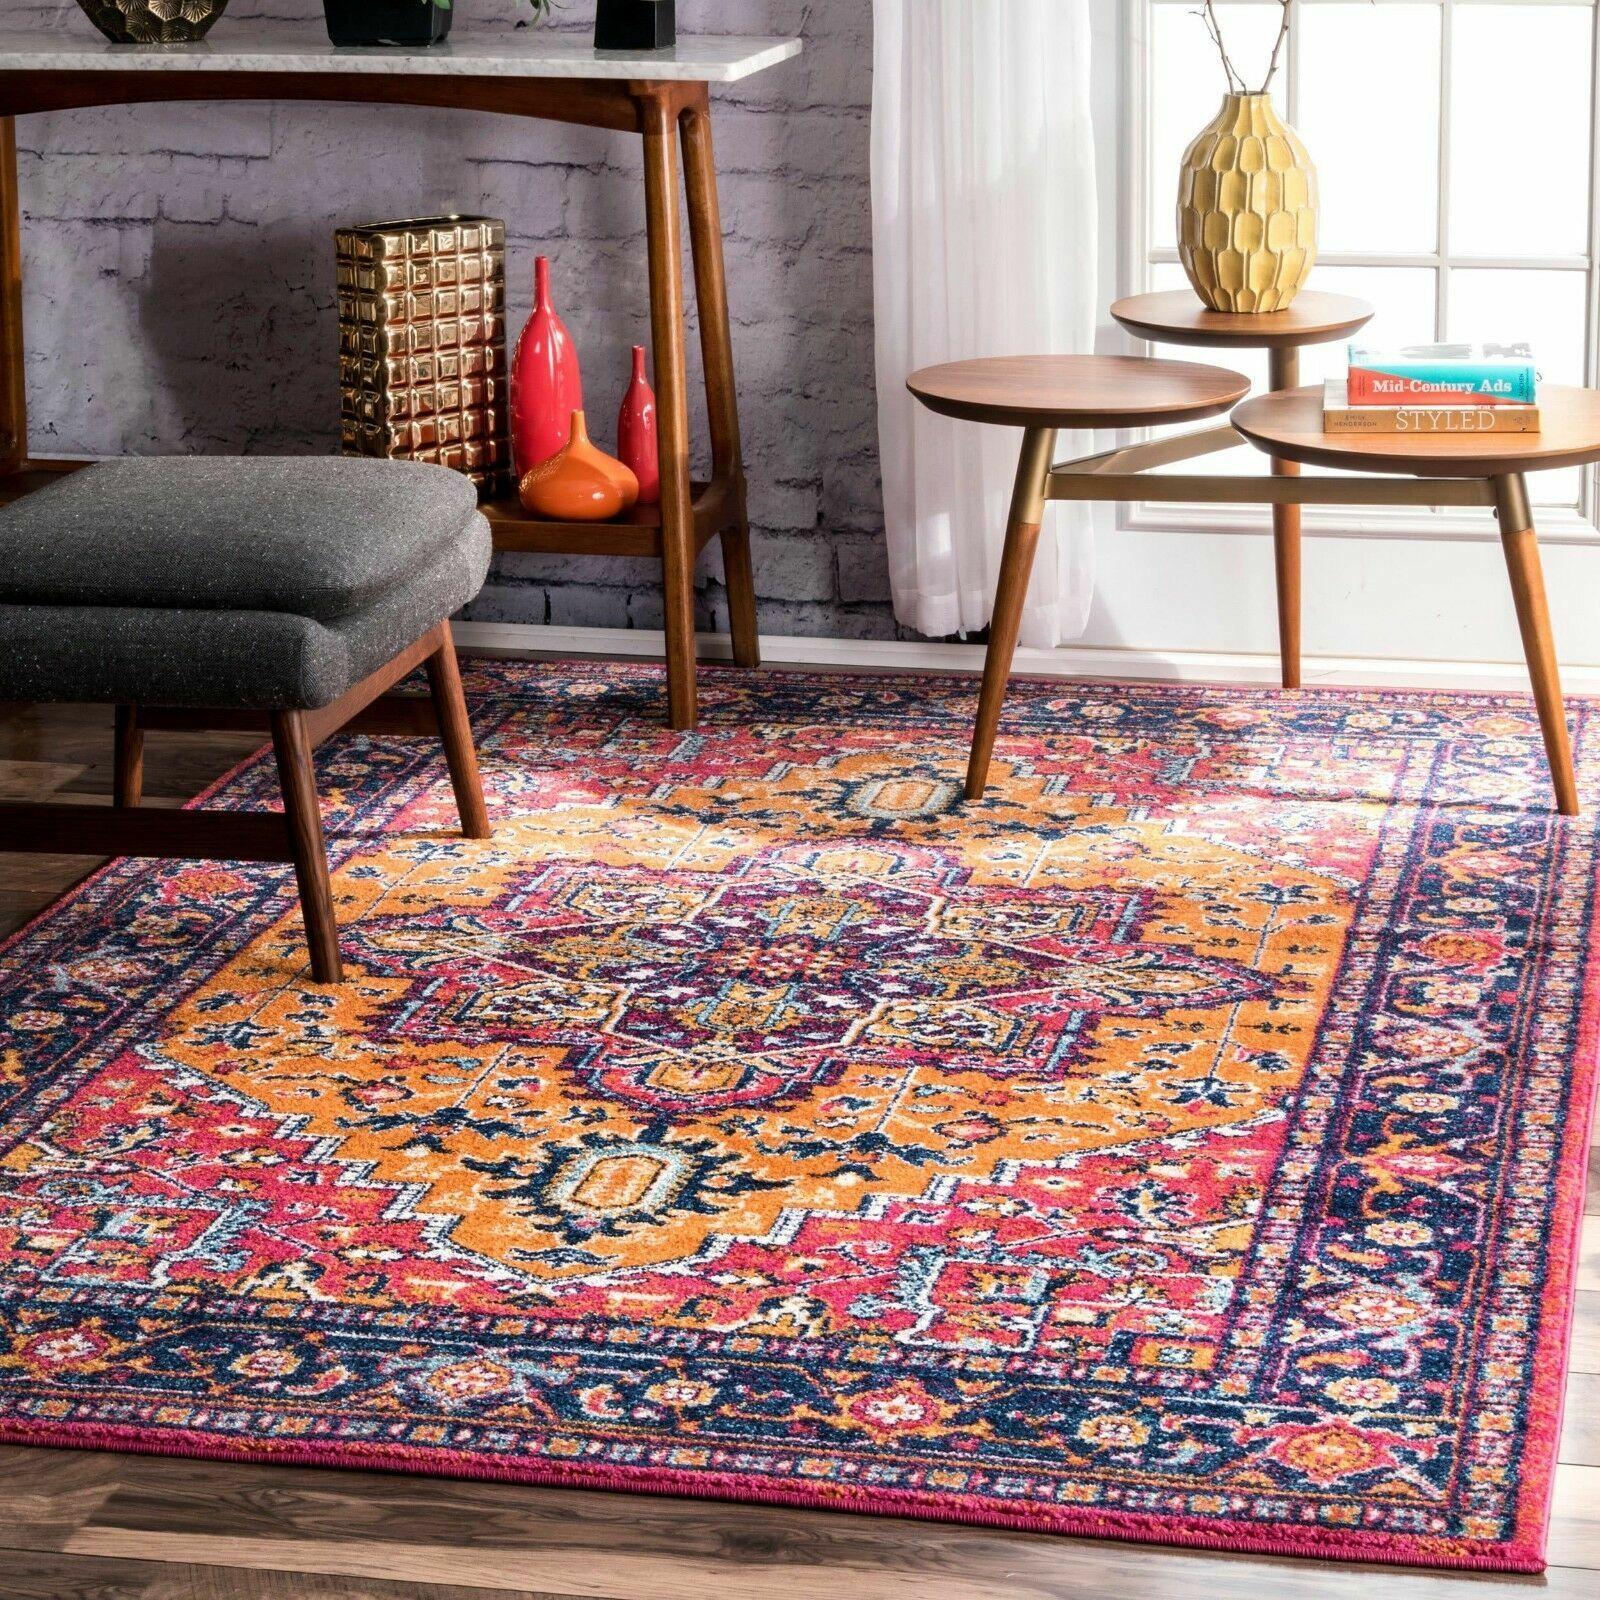 Nuloom Traditional Vintage Bohemian Area Rug In Pink Purple Orange Multi For Sale Online